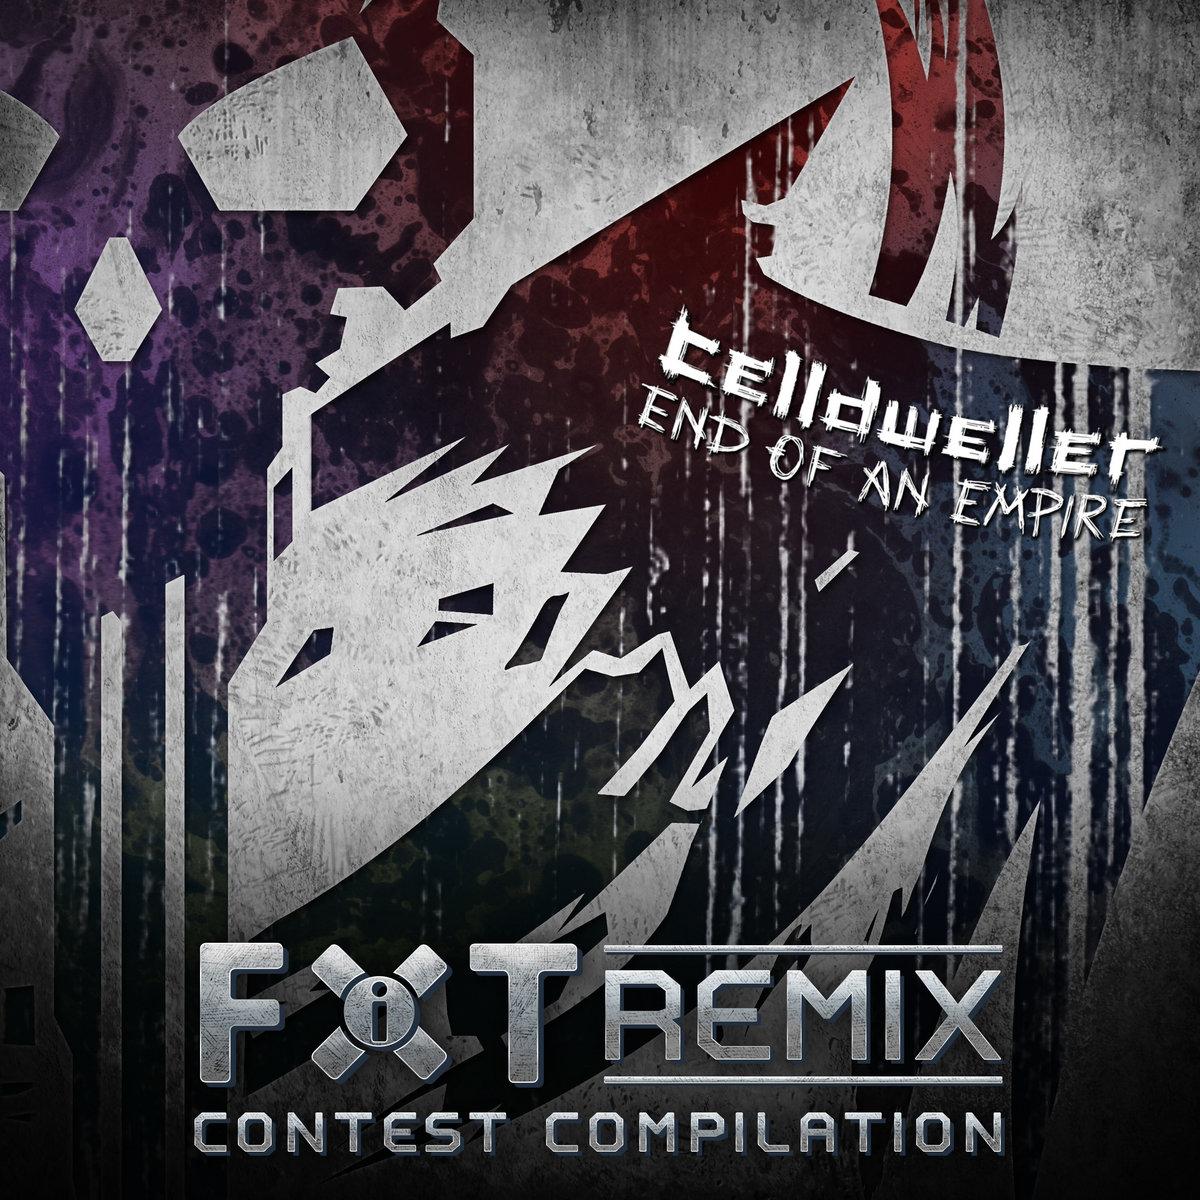 End of an Empire (Remix Contest Compilation) | Celldweller